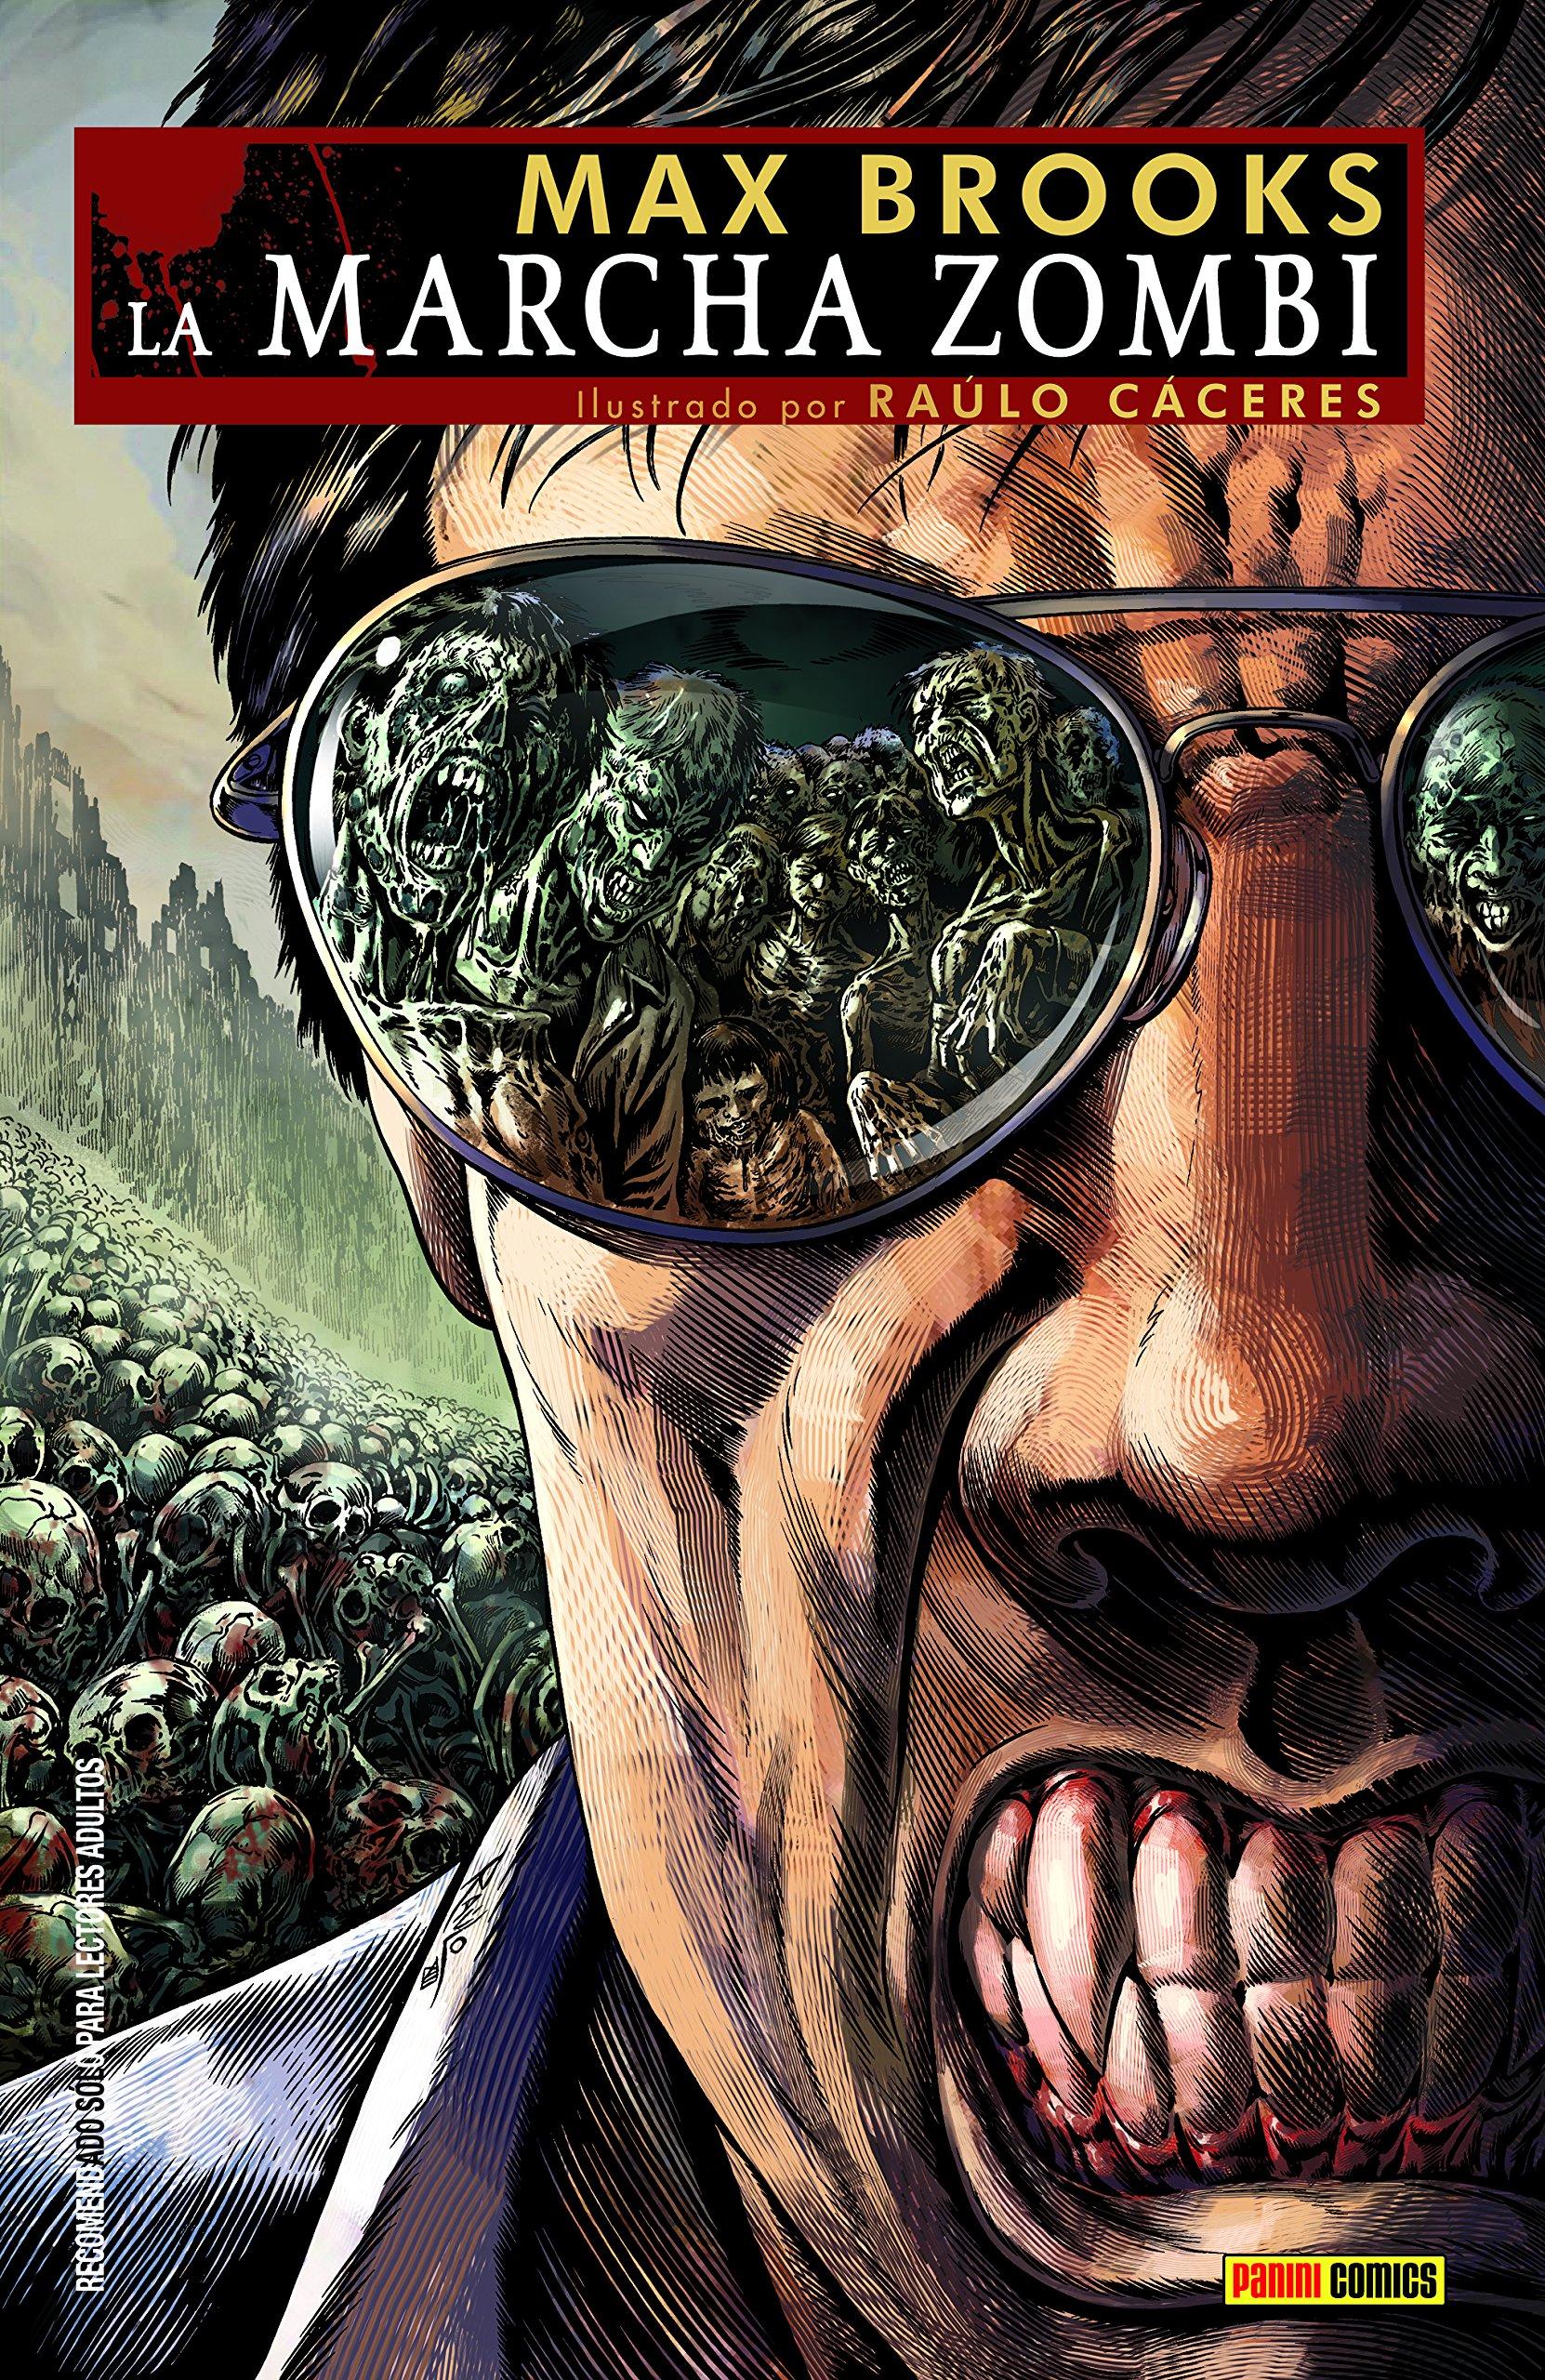 La Marcha Zombie De Max Brooks 2: Amazon.es: Max Brooks: Libros